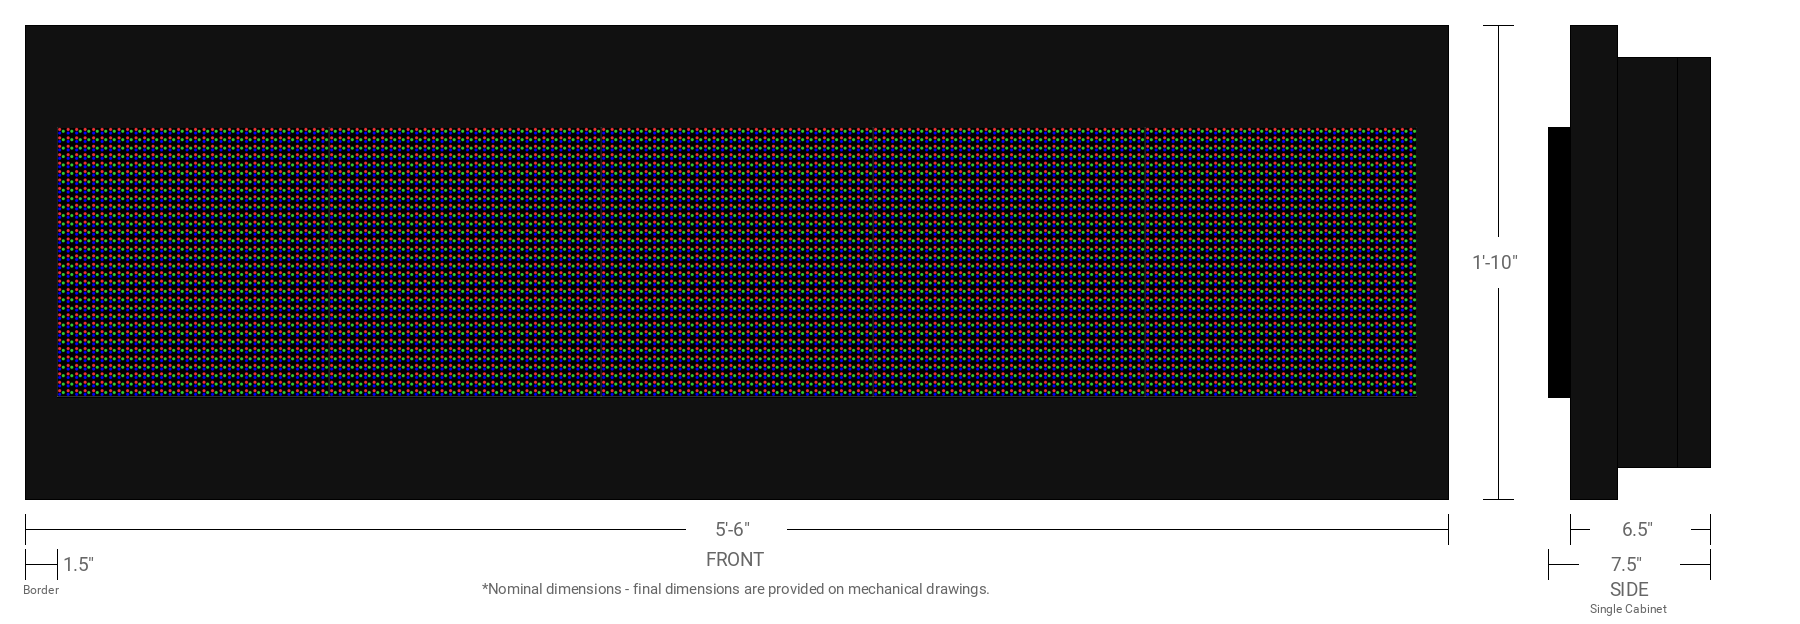 Aurora 10mm 32x160 Single Sided Full Color LED Display